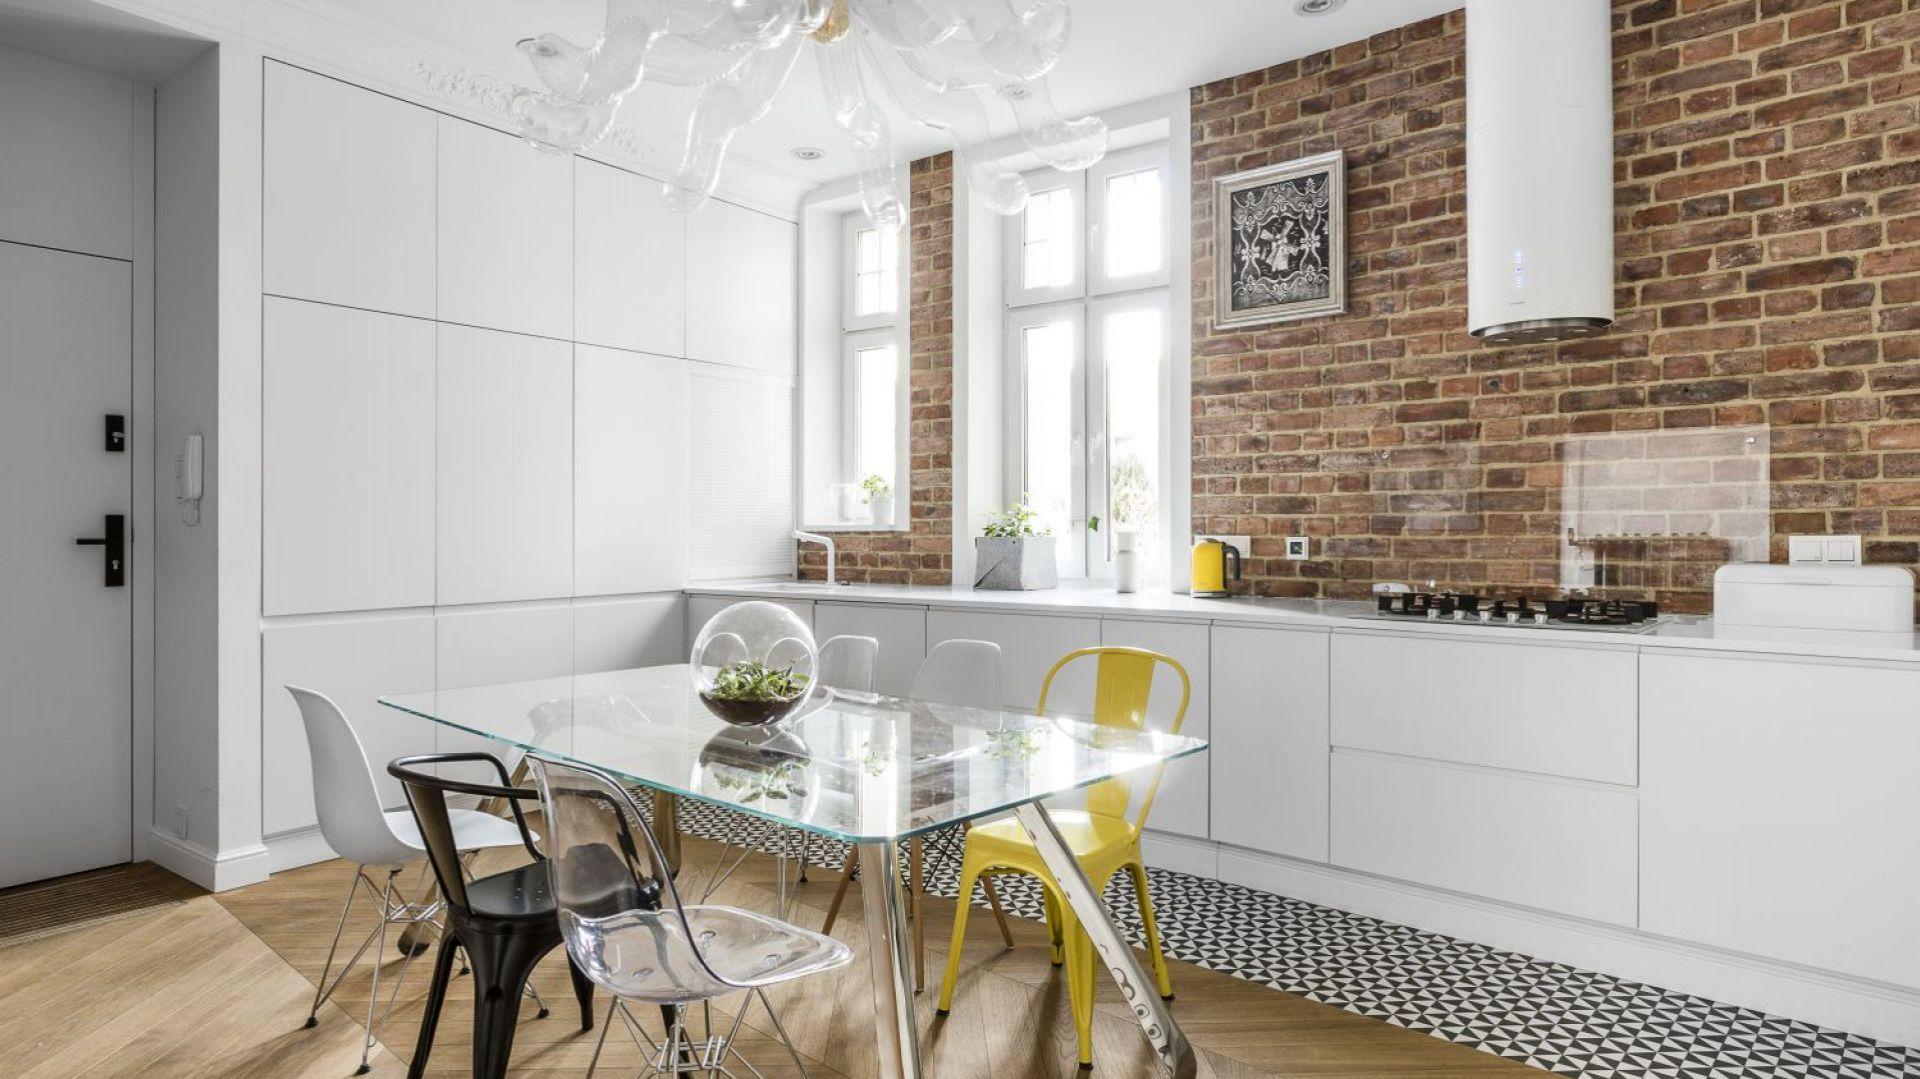 Kuchnia dla rodziny. Projekt: Anna Maria Sokołowska. Fot. Foto&Mohito